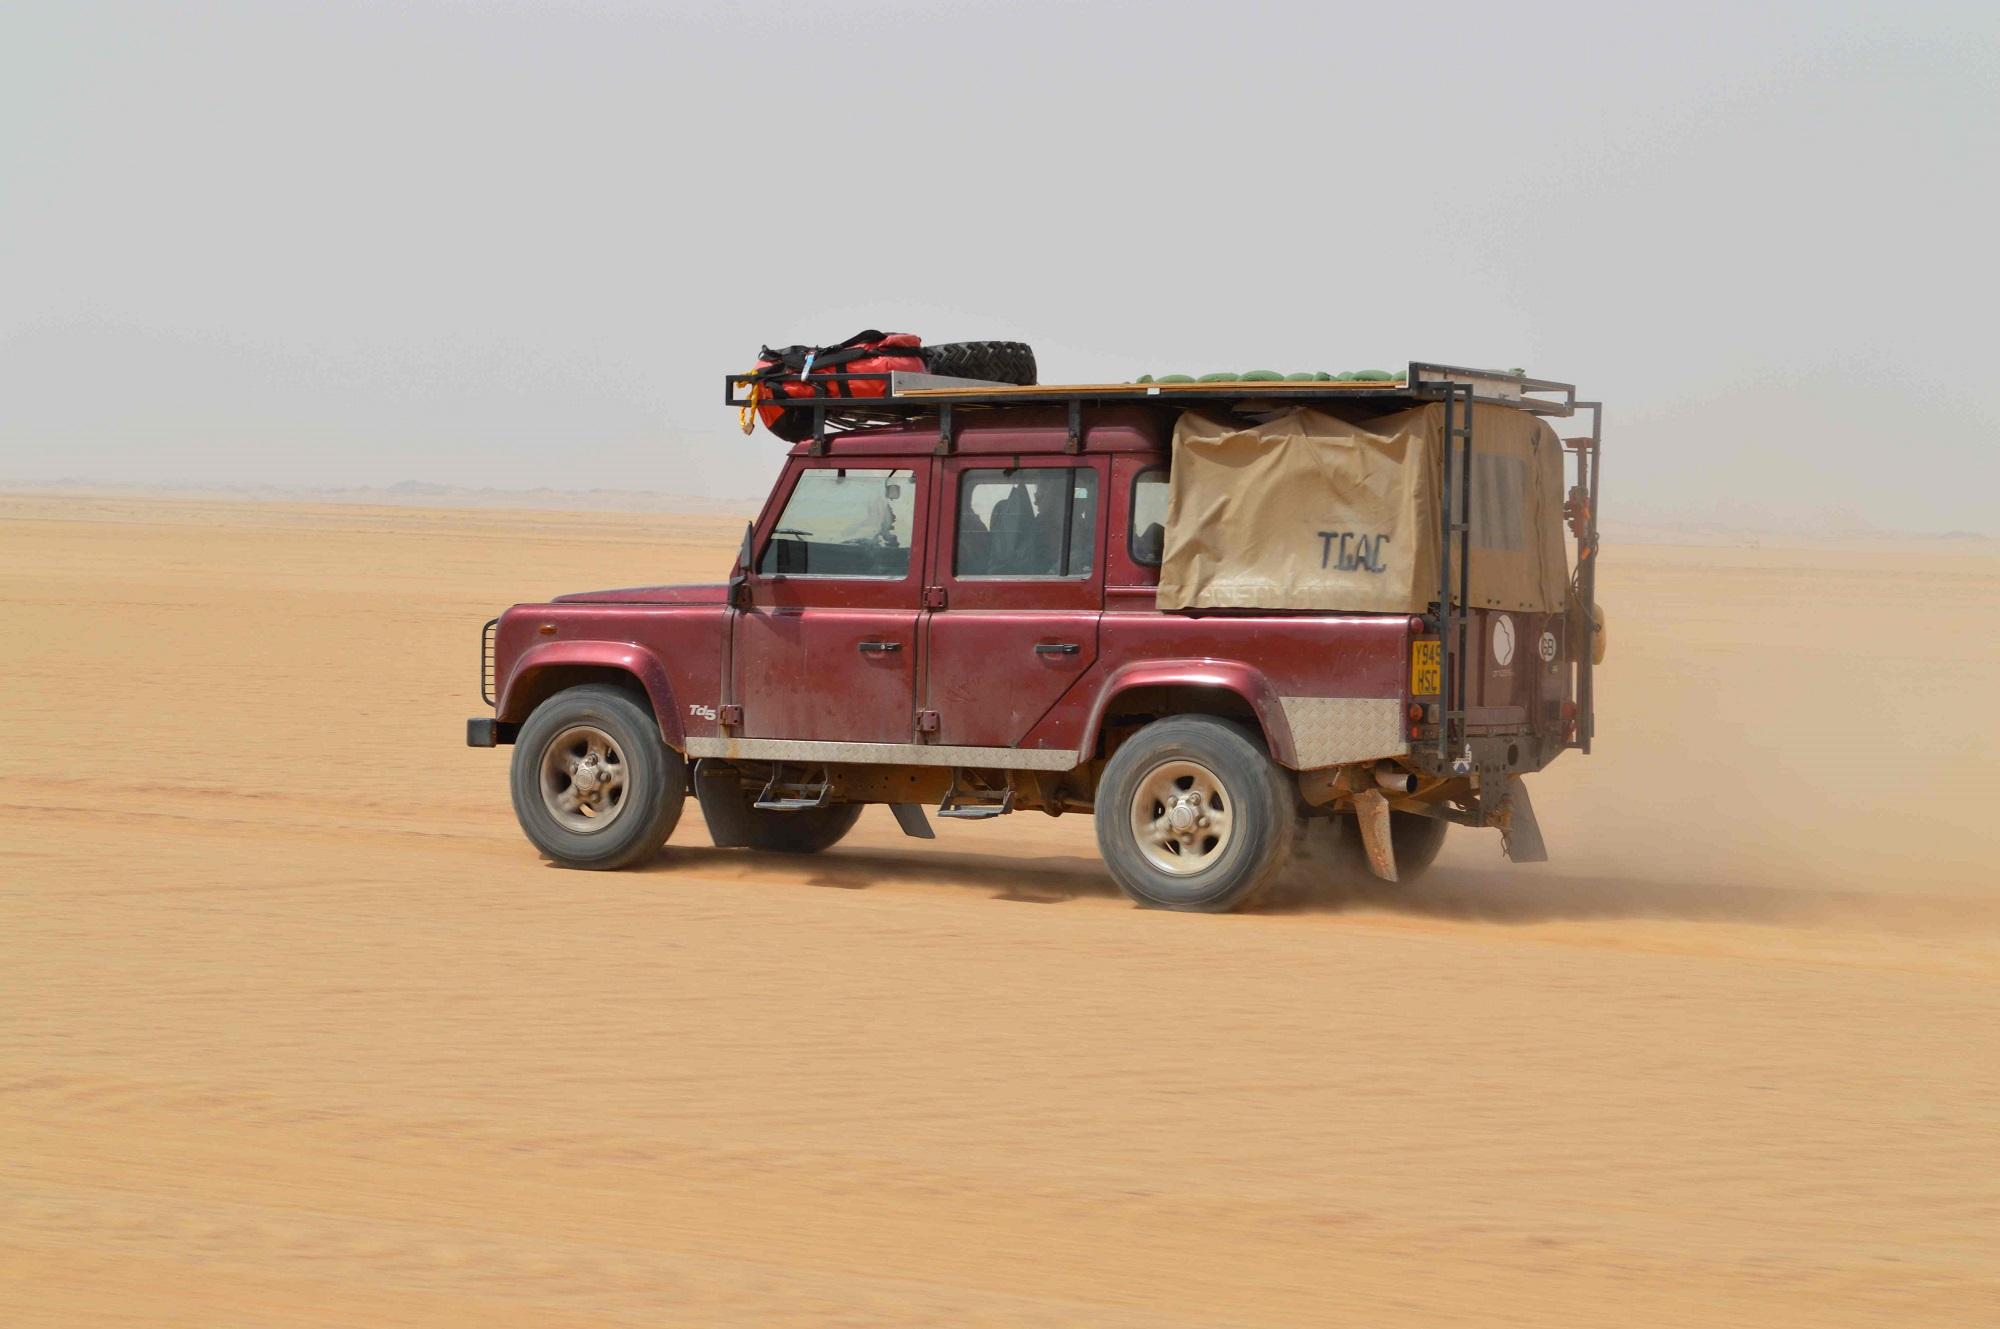 2014-CMCPHERSON-SUDAN-08